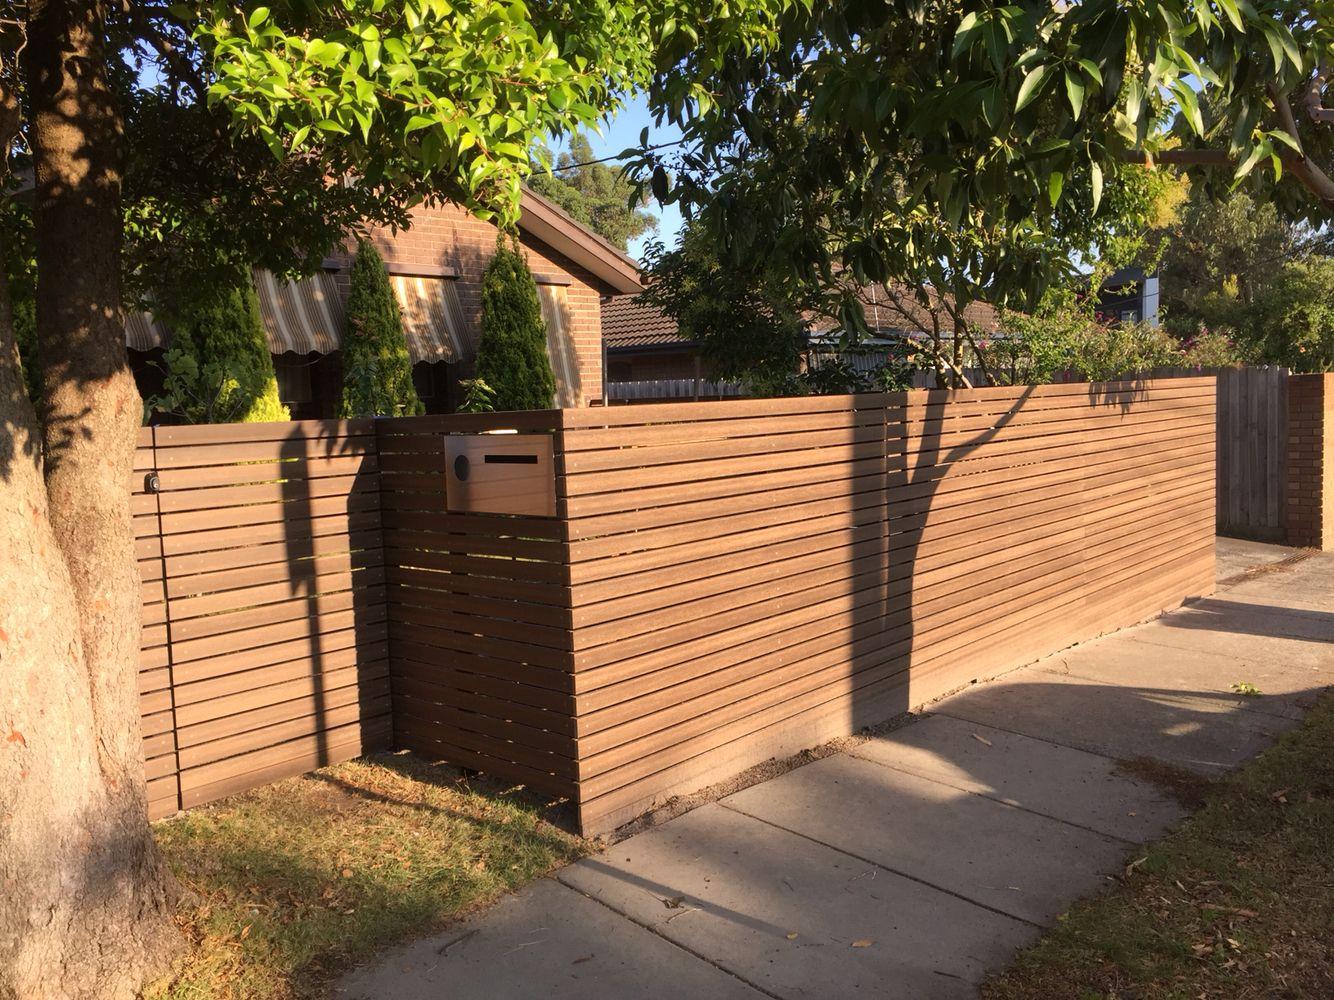 modwood fence with black posts. black butt colour. | zaungestaltung